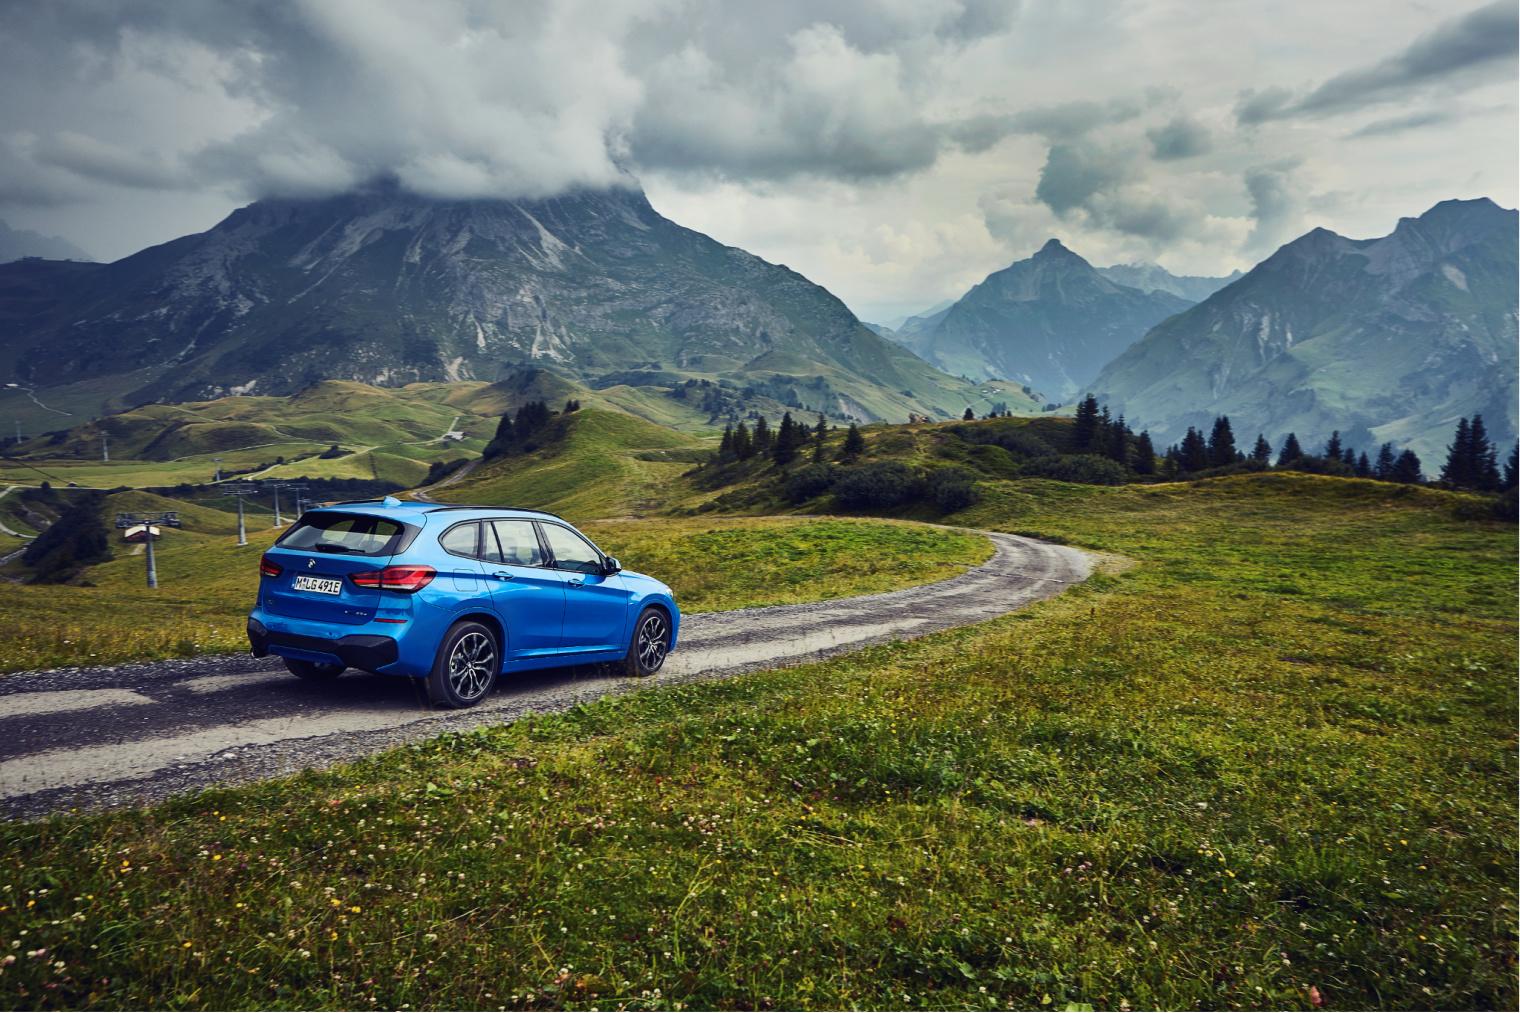 Retro nuova BMW X1 ibrida plug-in